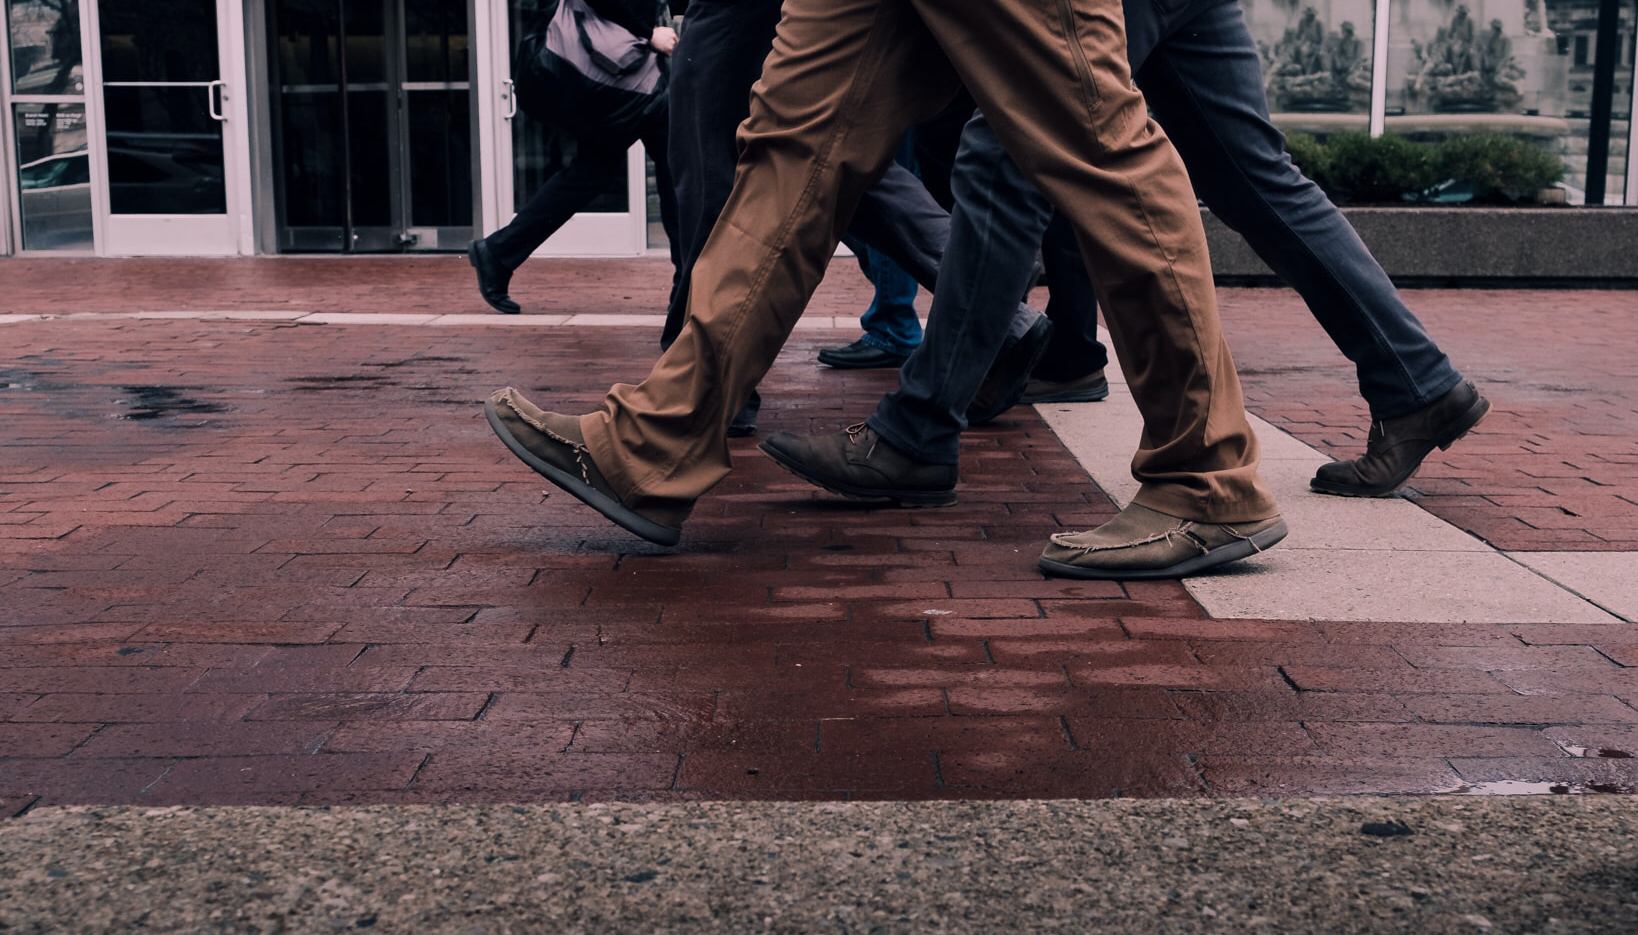 Fötter på en gata